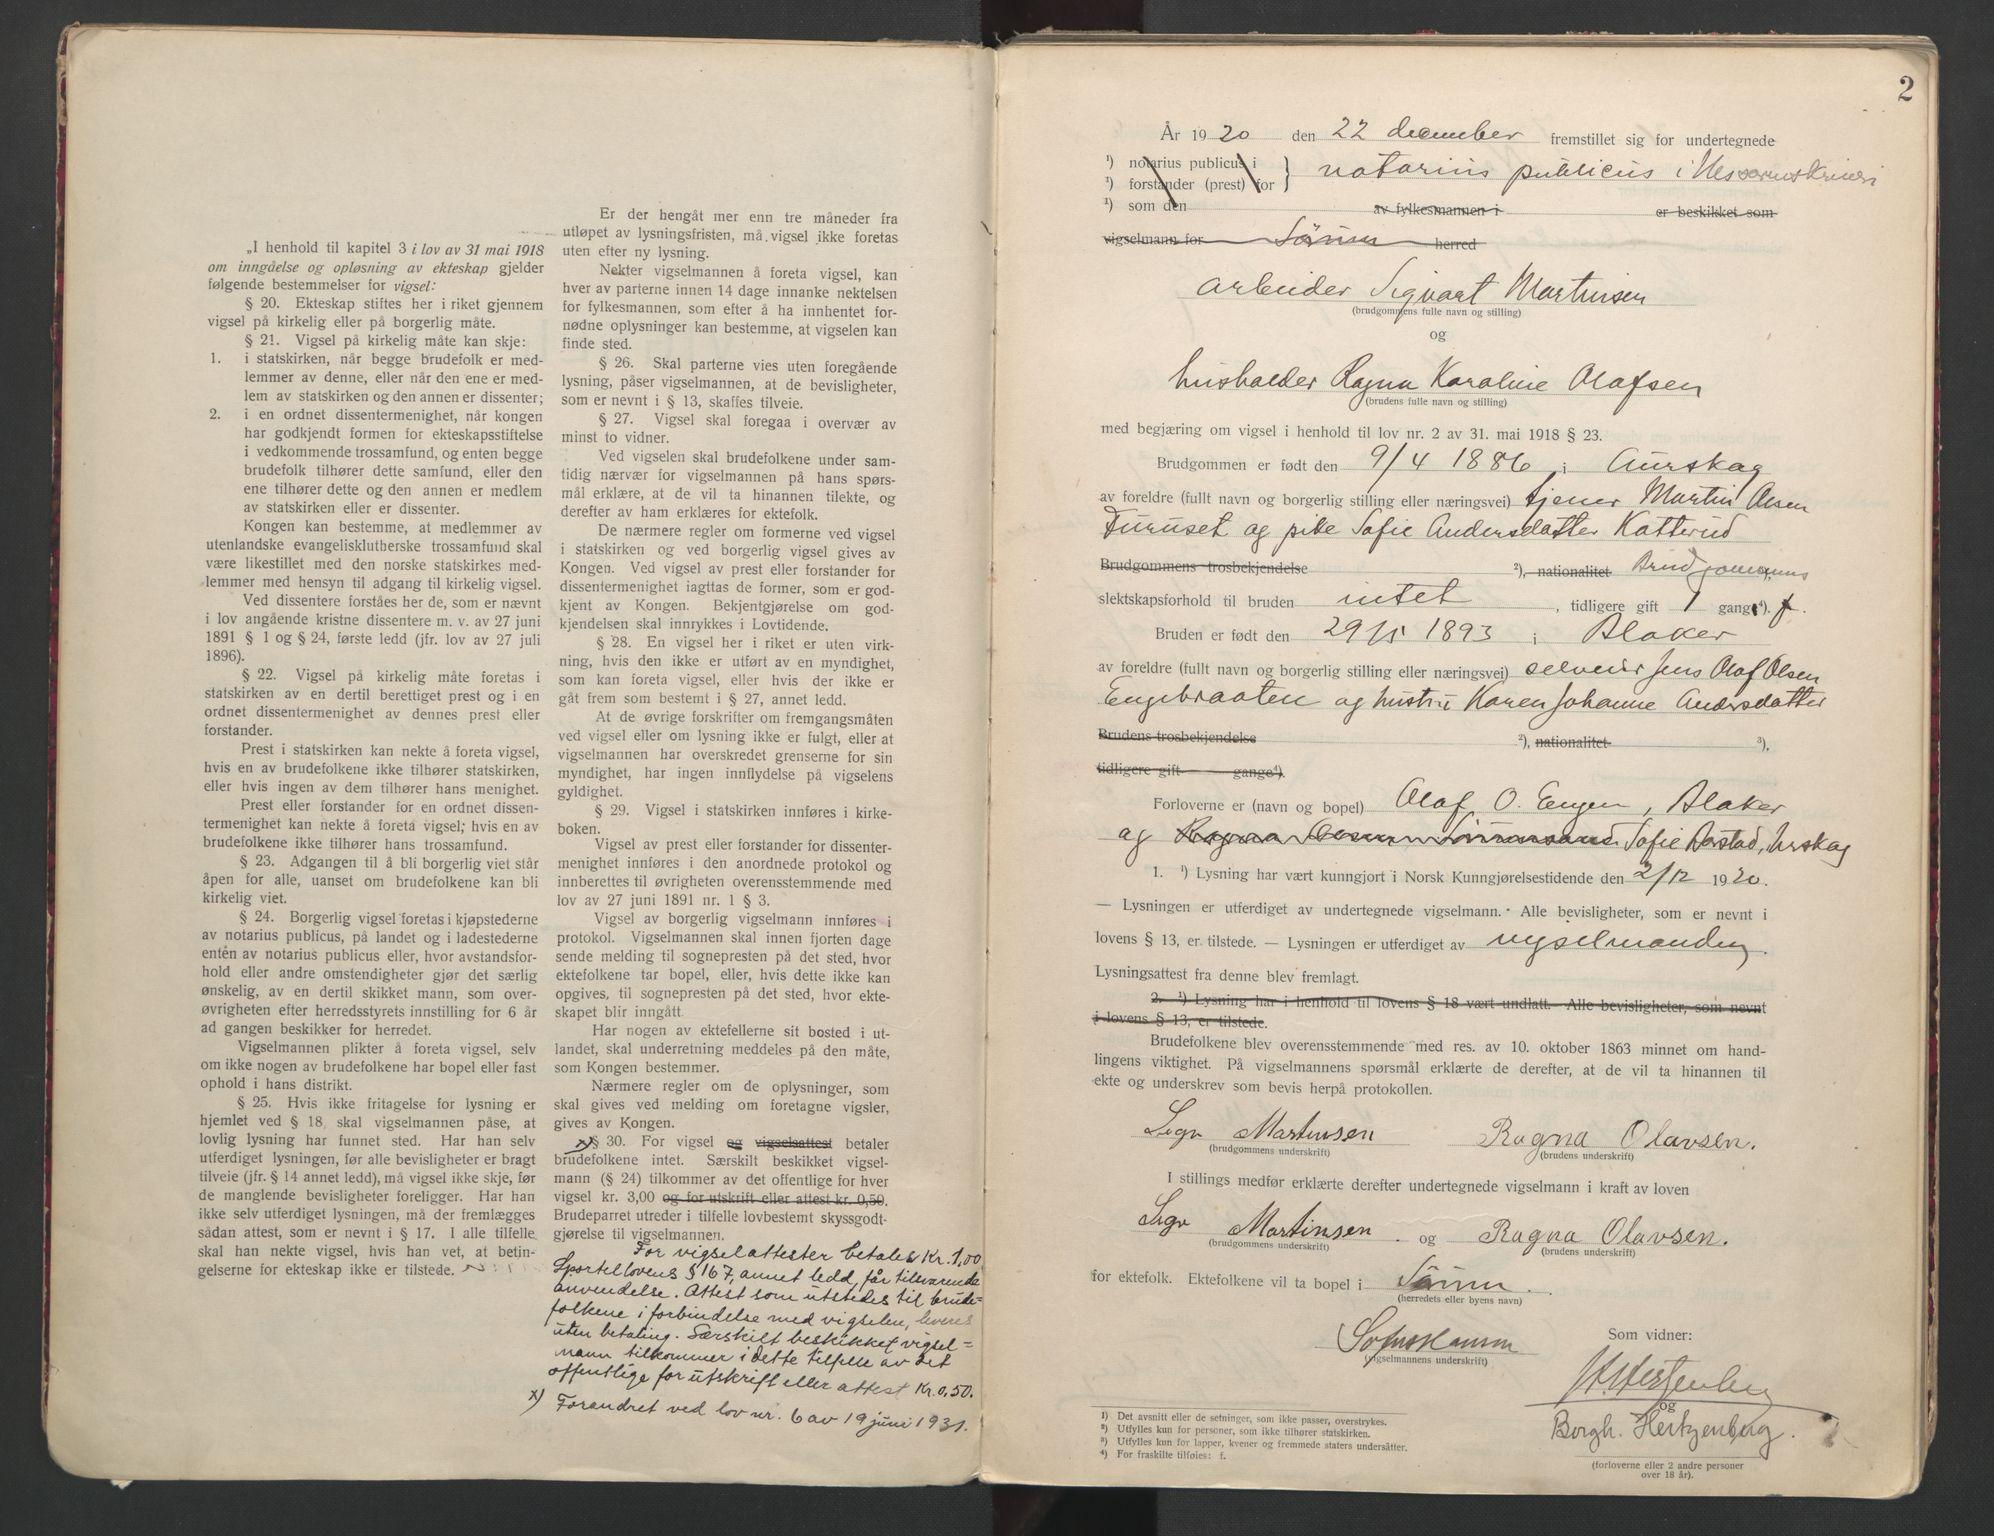 SAO, Nes tingrett, L/Lc/Lca/L0001: Vigselbok, 1920-1943, s. 2